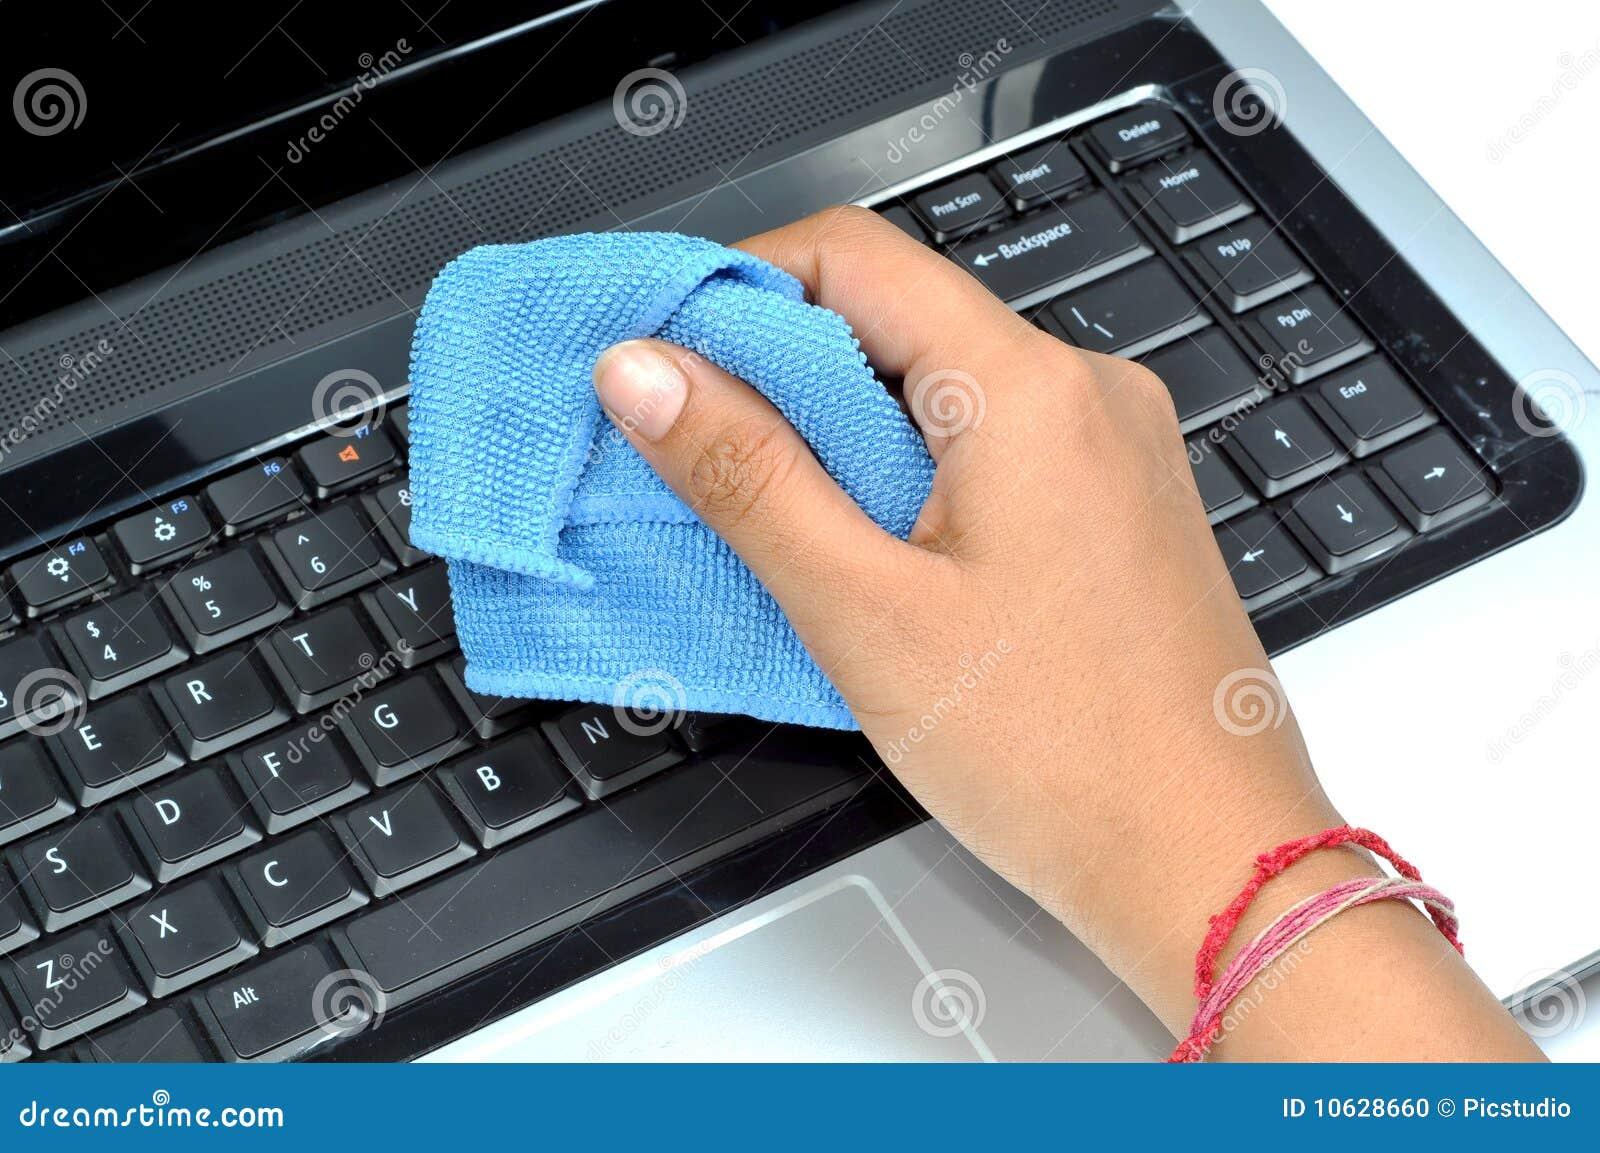 Cleaning laptop keyboard